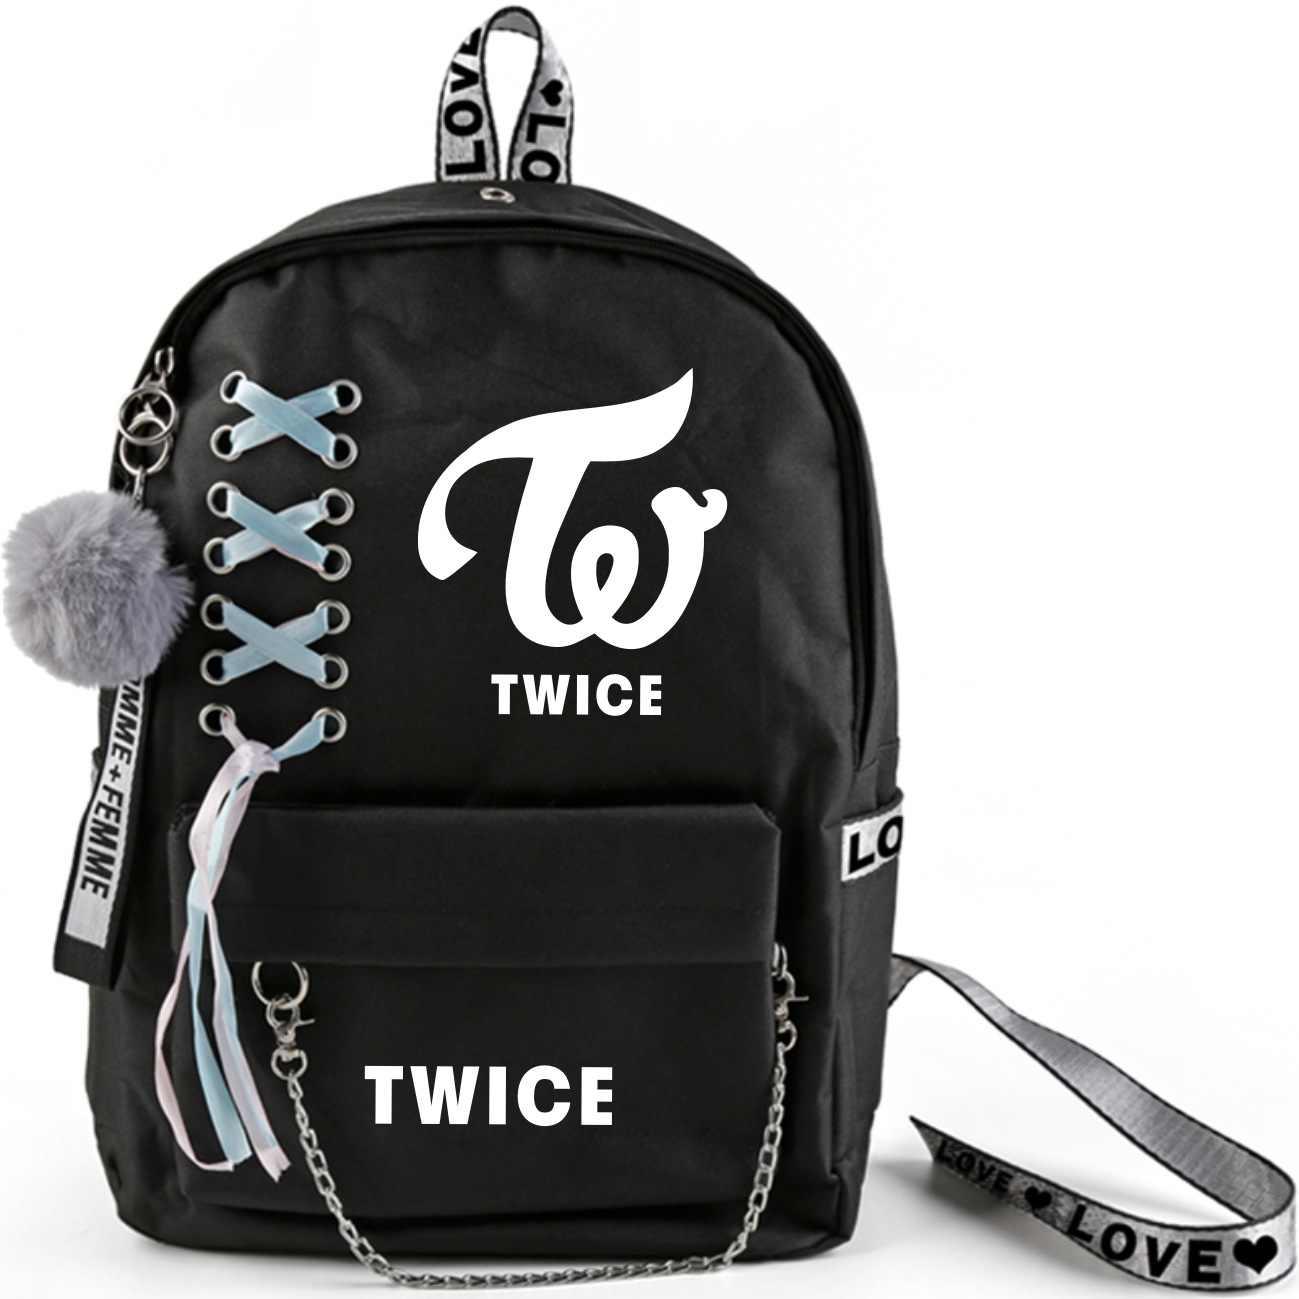 KPOP TWICE Momo Mina Tzuyu Sana Schoolbag Double Shoulder Bag Fresh-wrap, Korean-style Backpack High-capacity Bag Students New